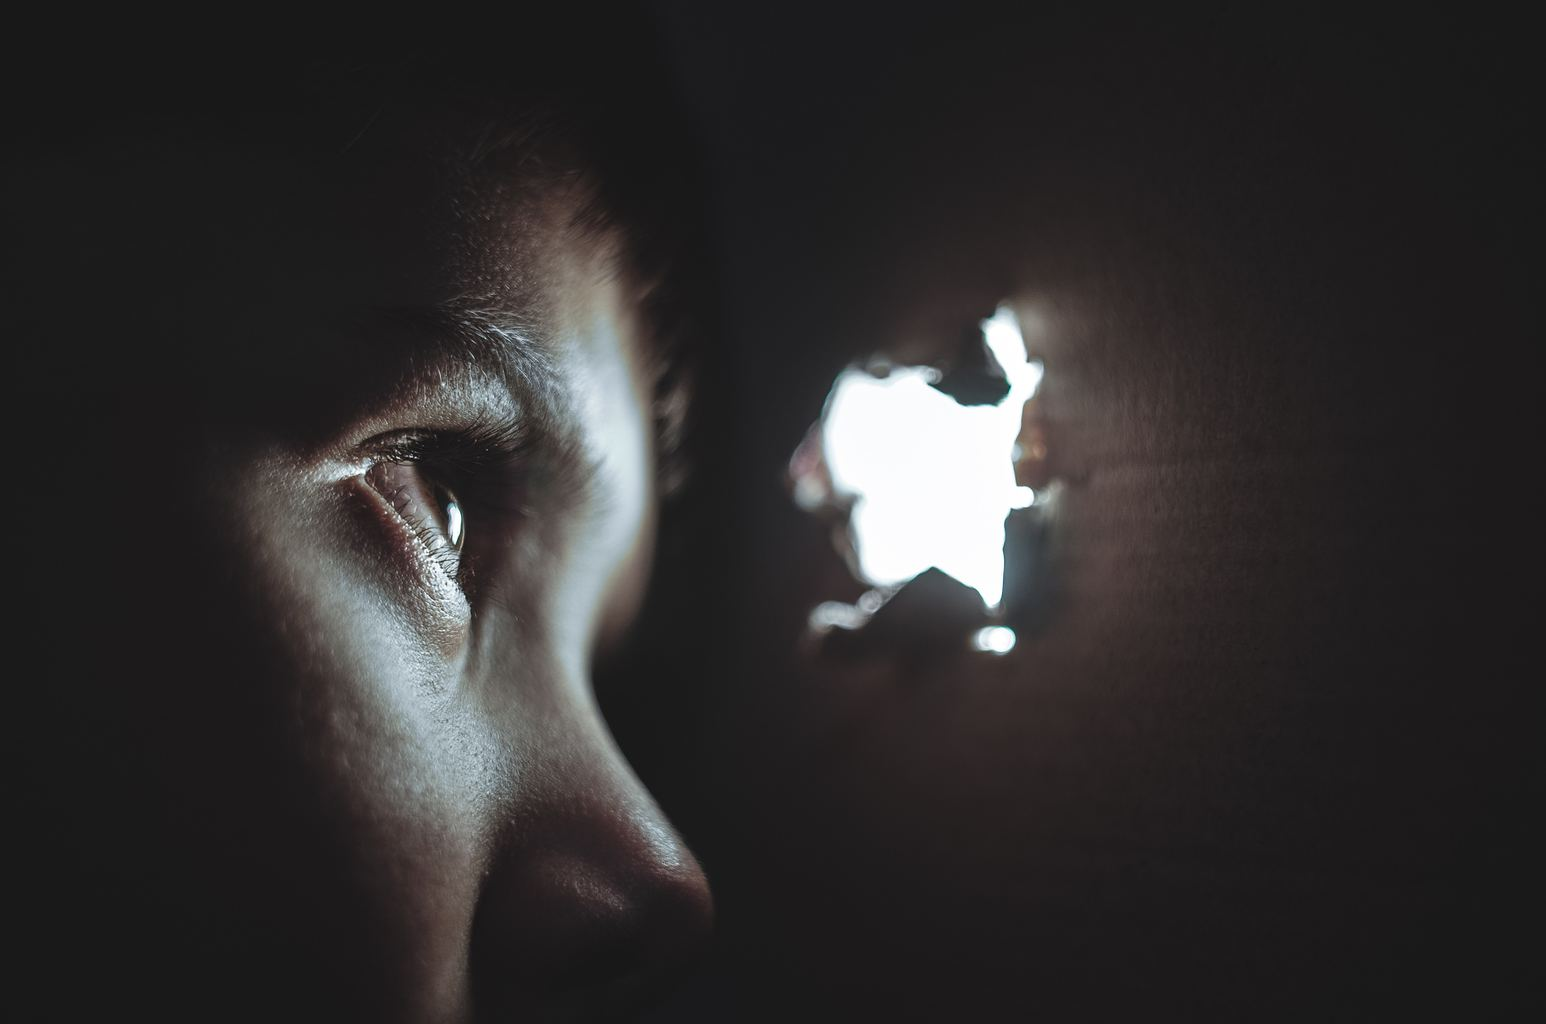 retrato de un niño mirando por un agujero